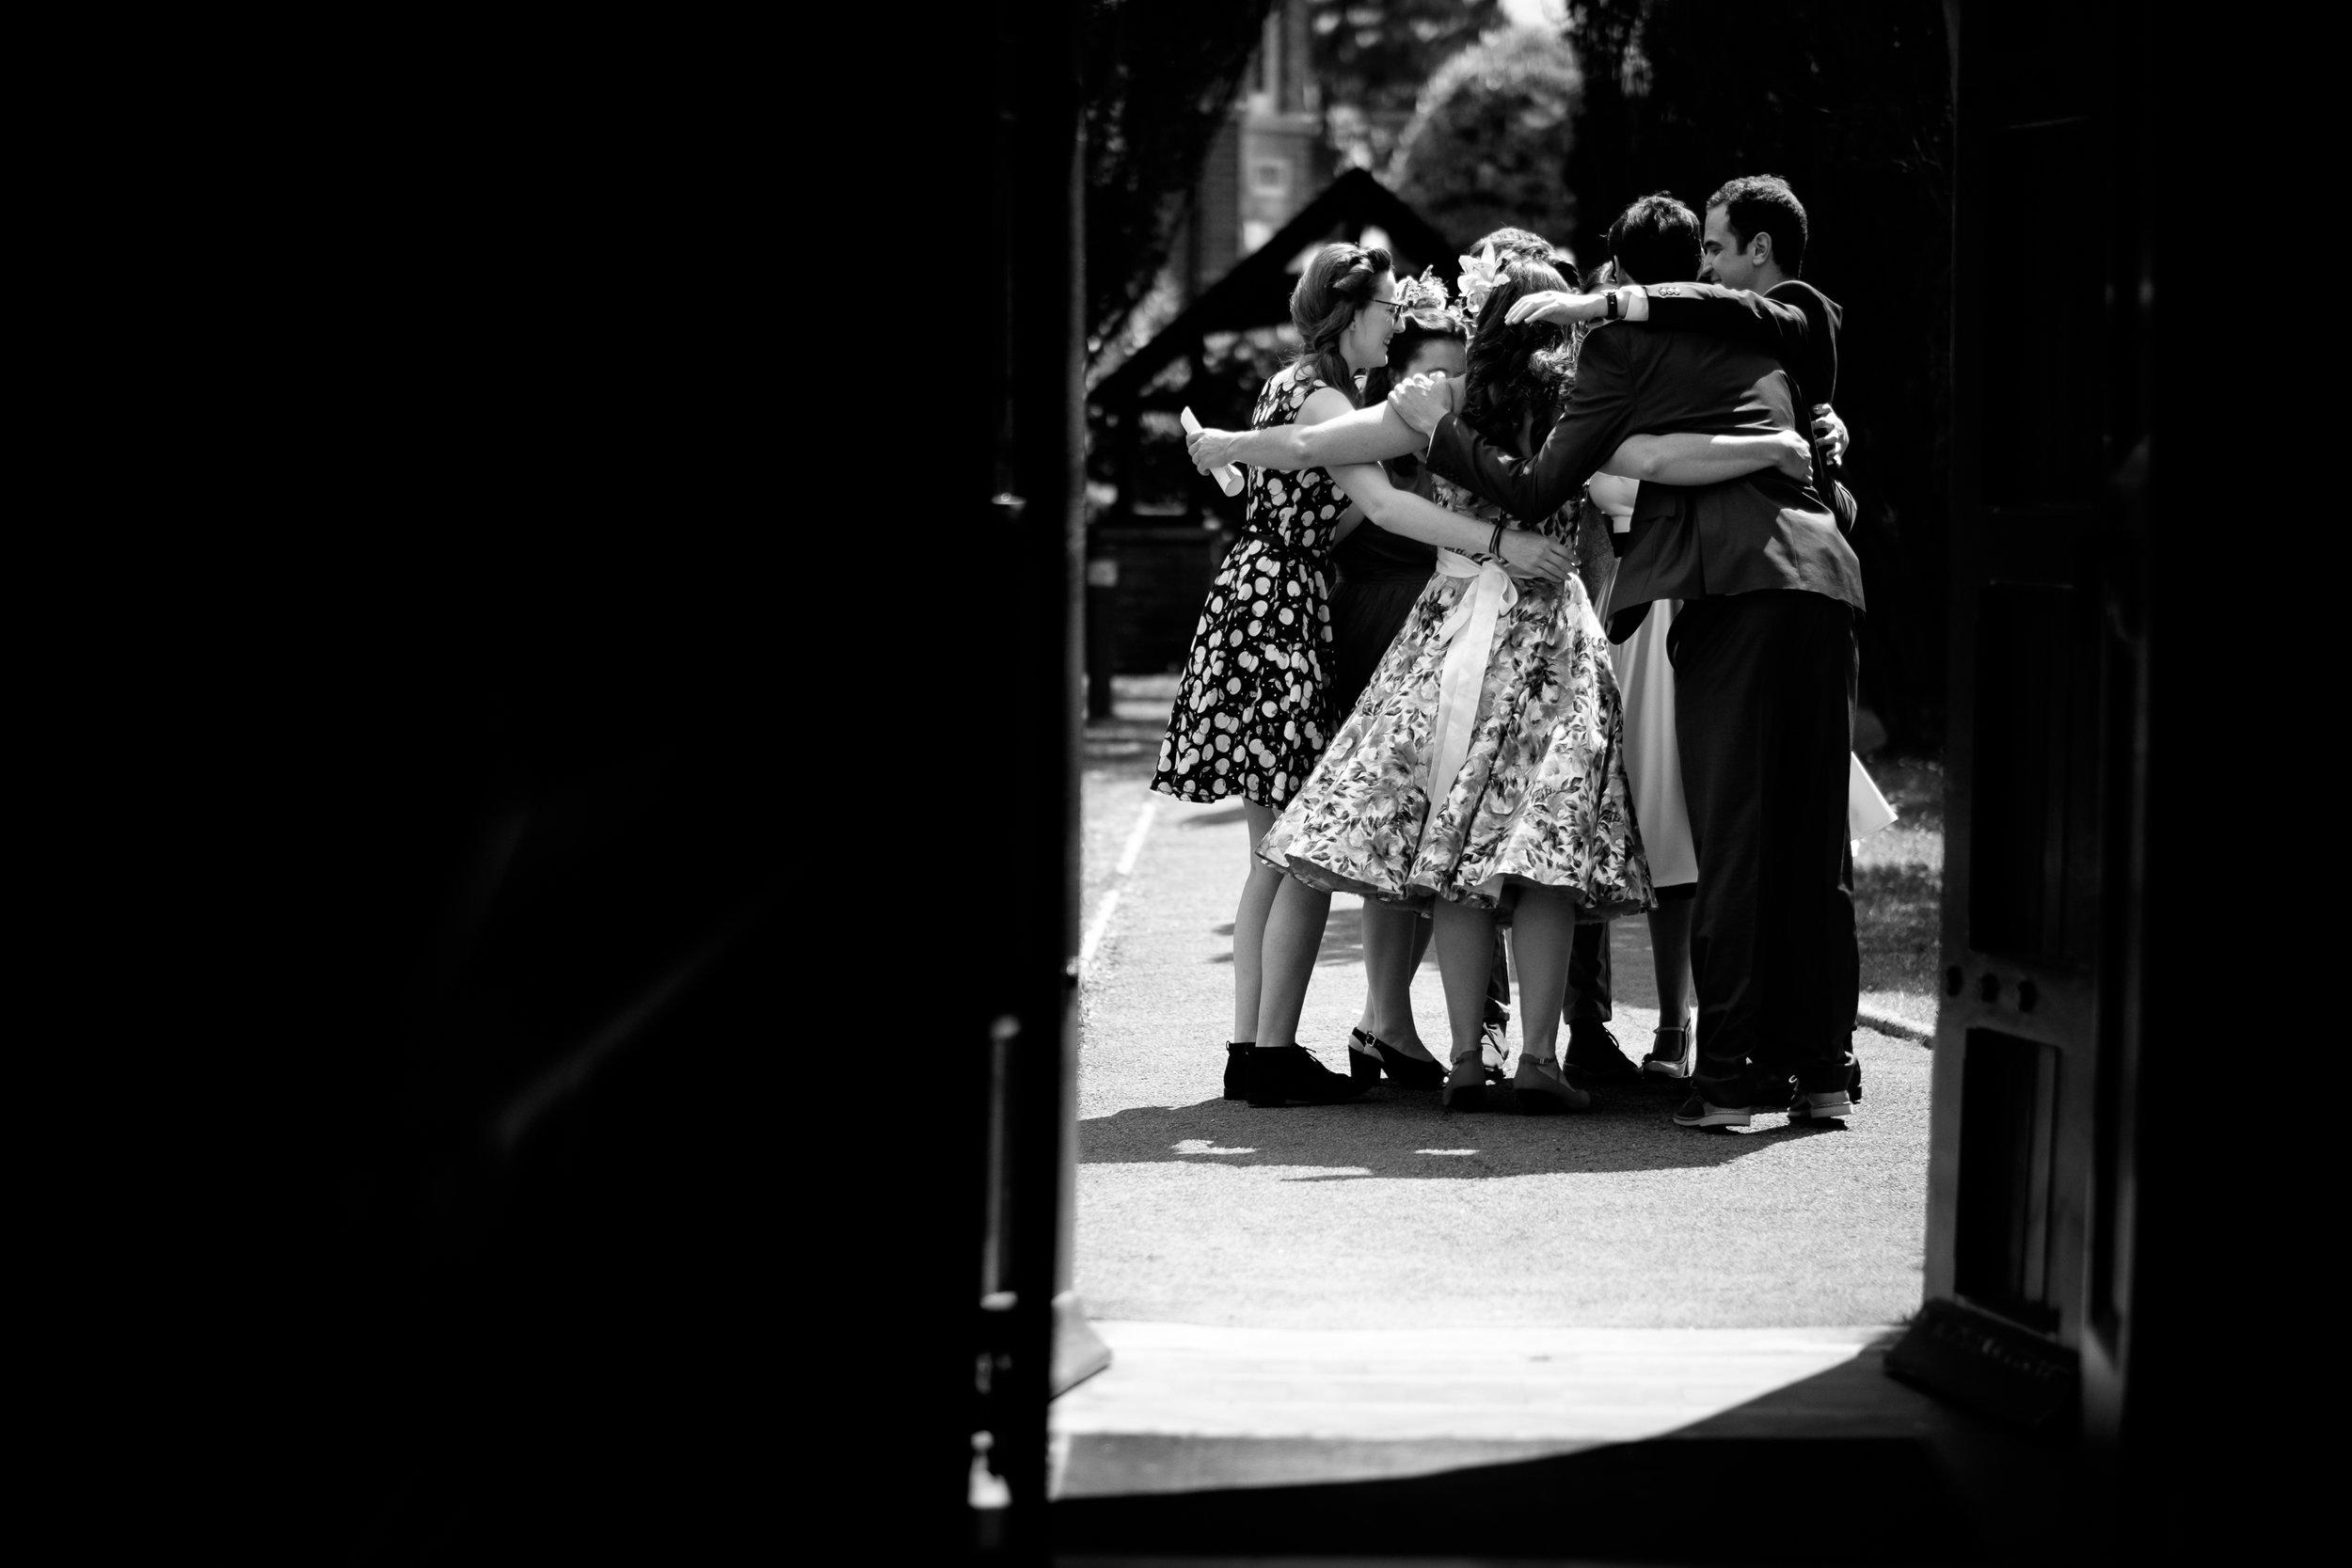 The embrace of friends.jpg